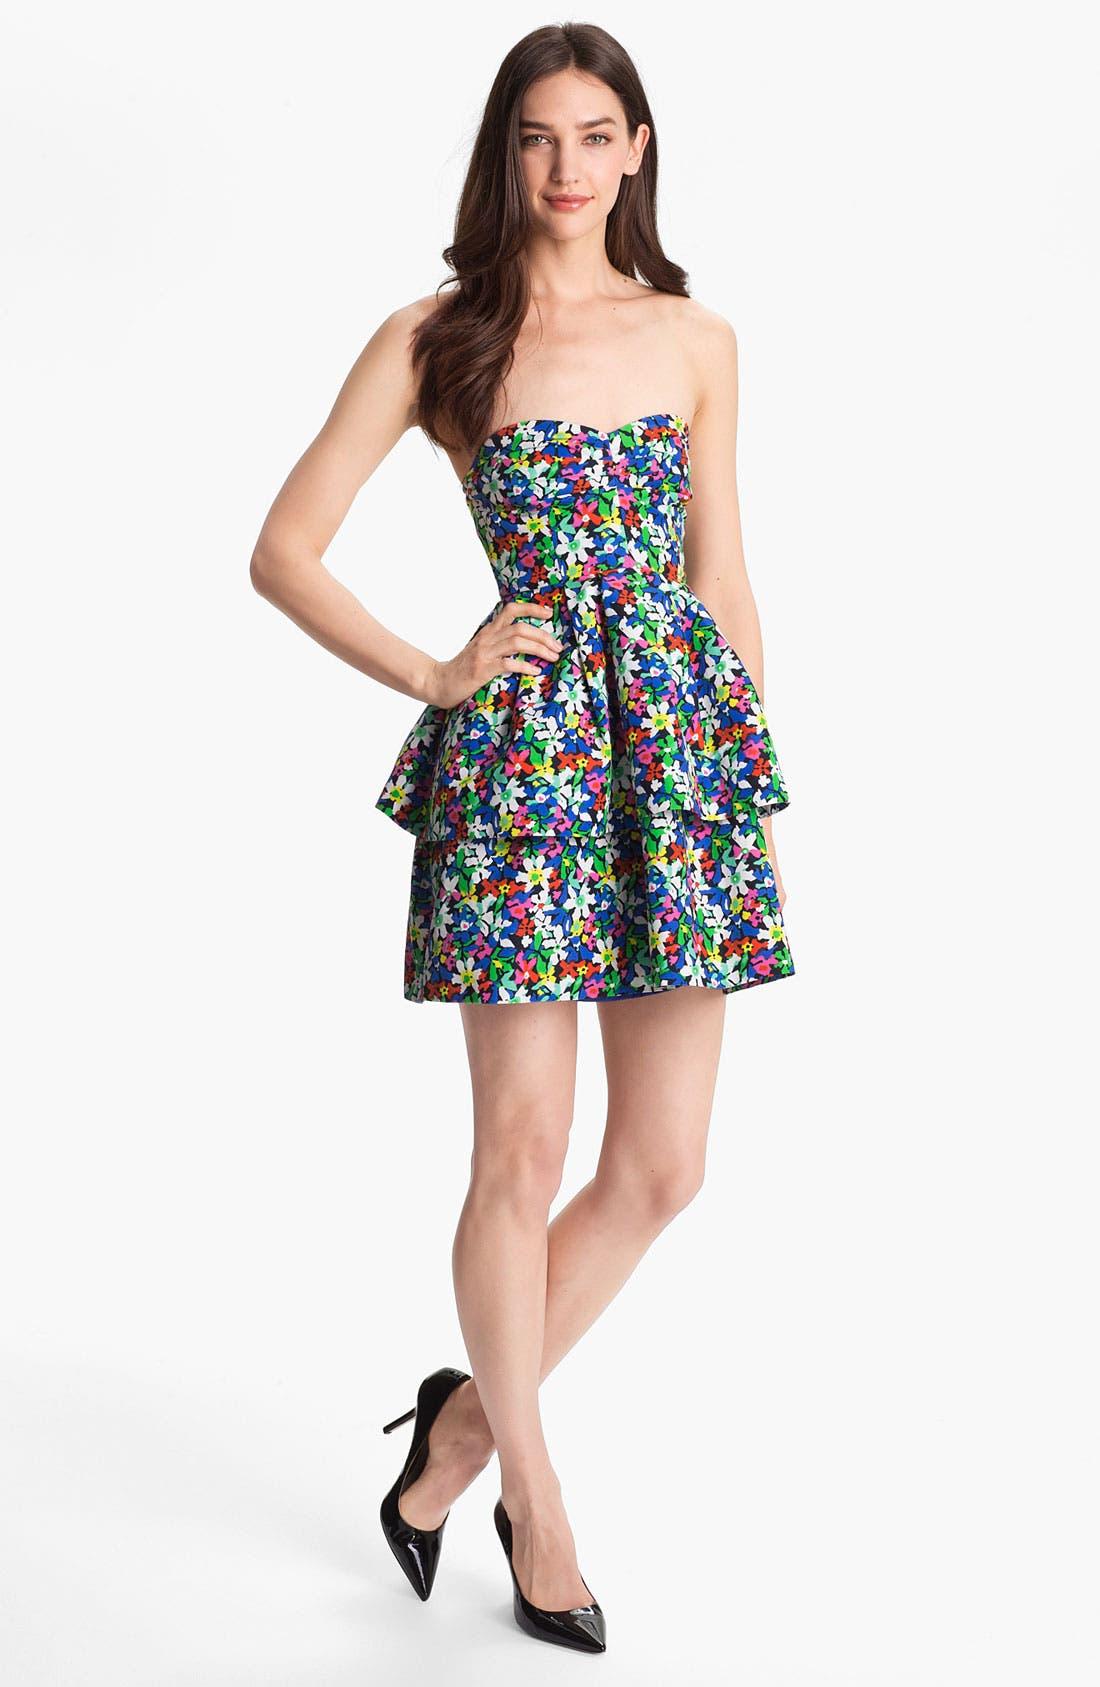 Alternate Image 1 Selected - kate spade new york 'karmen' cotton blend fit & flare dress